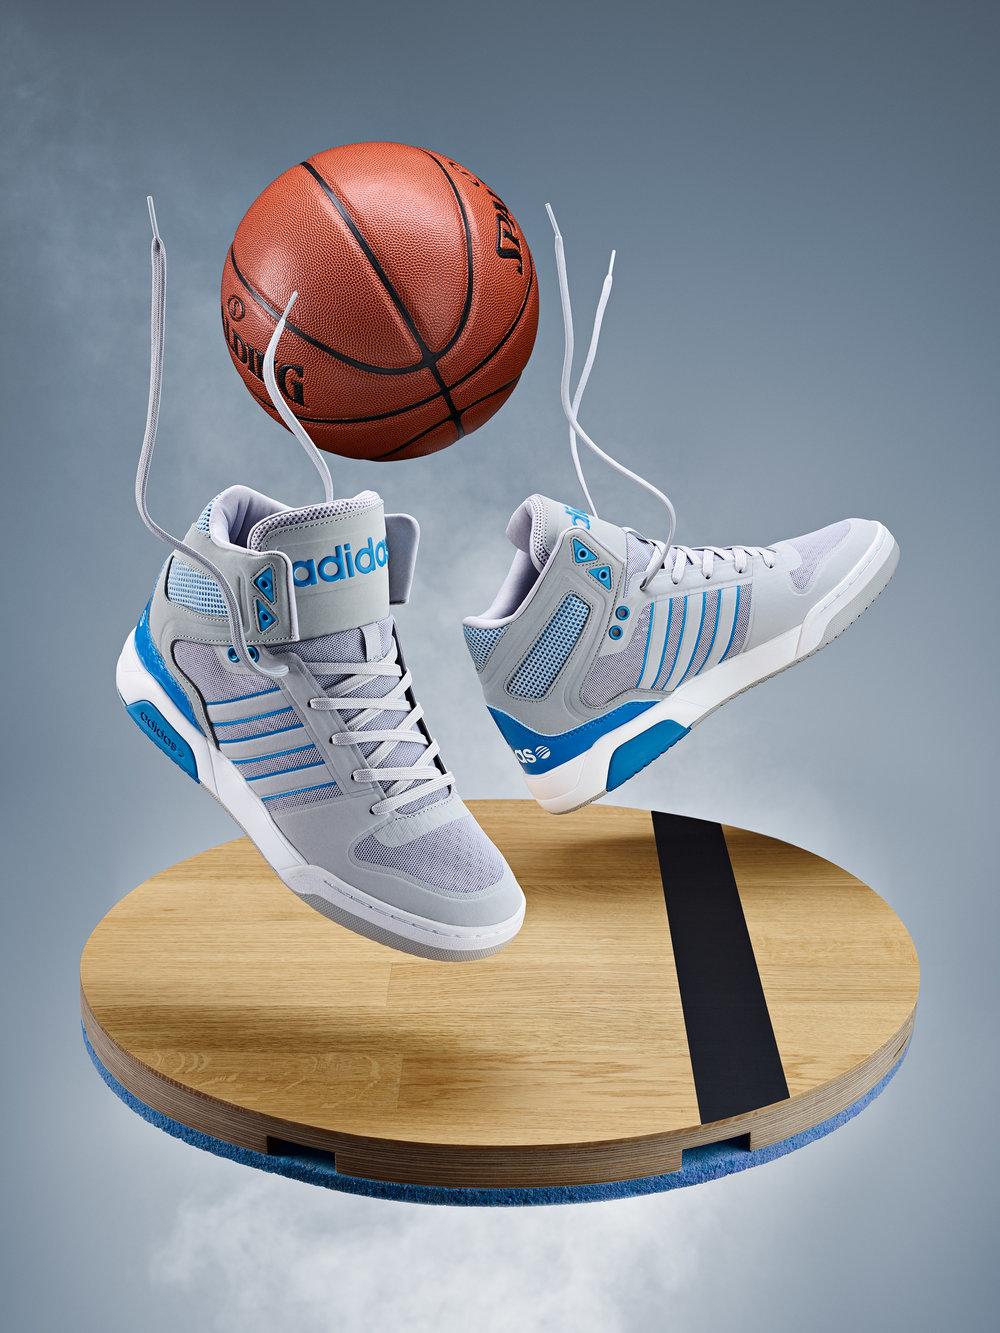 robvanderplank-trainer-test-basketball-v2.jpg